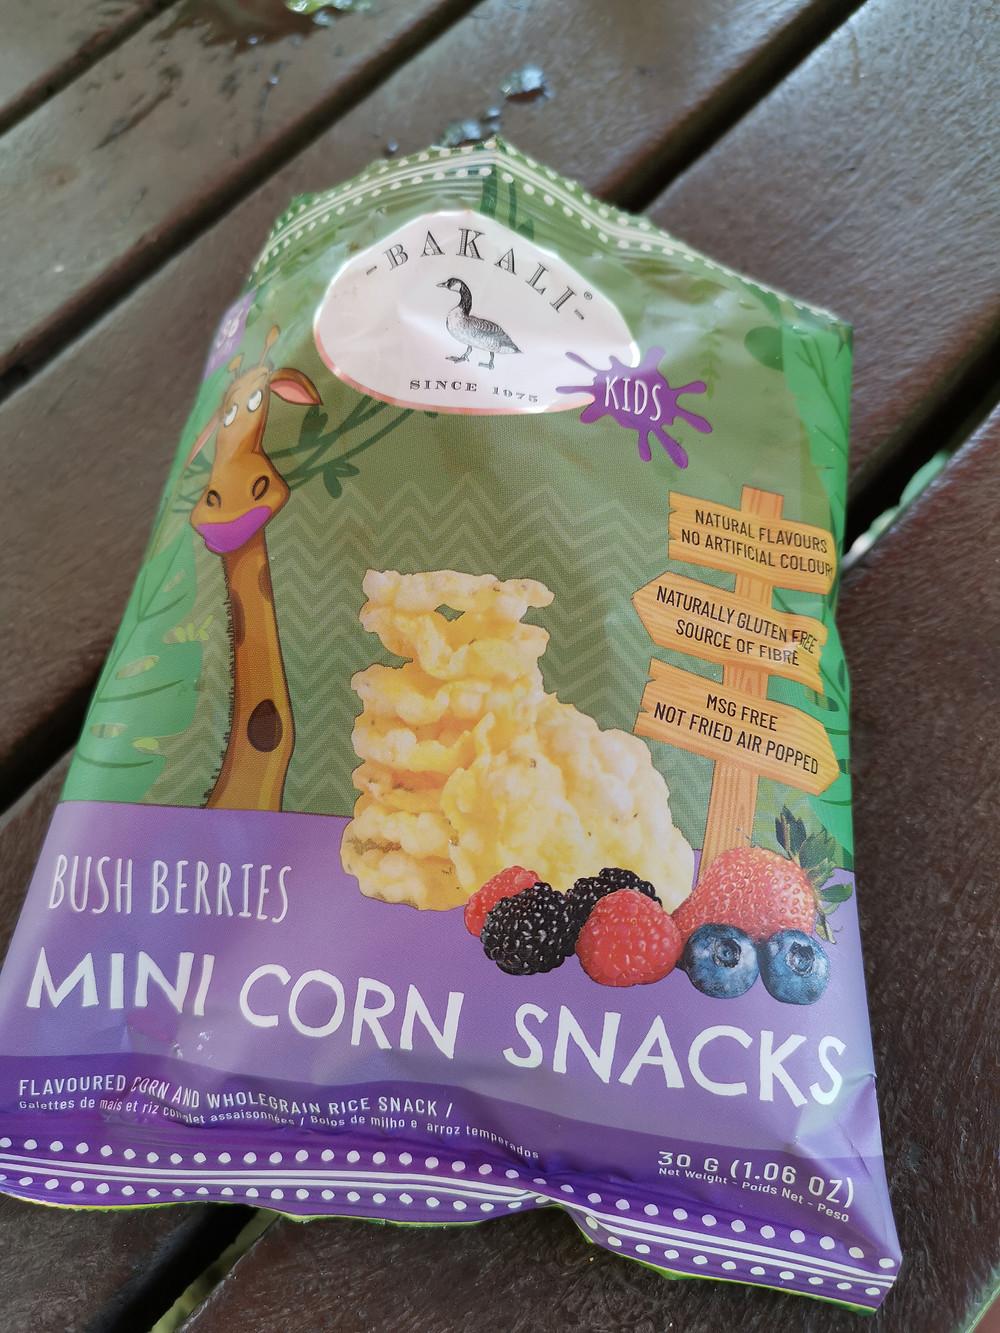 Bushberries mini corn snacks